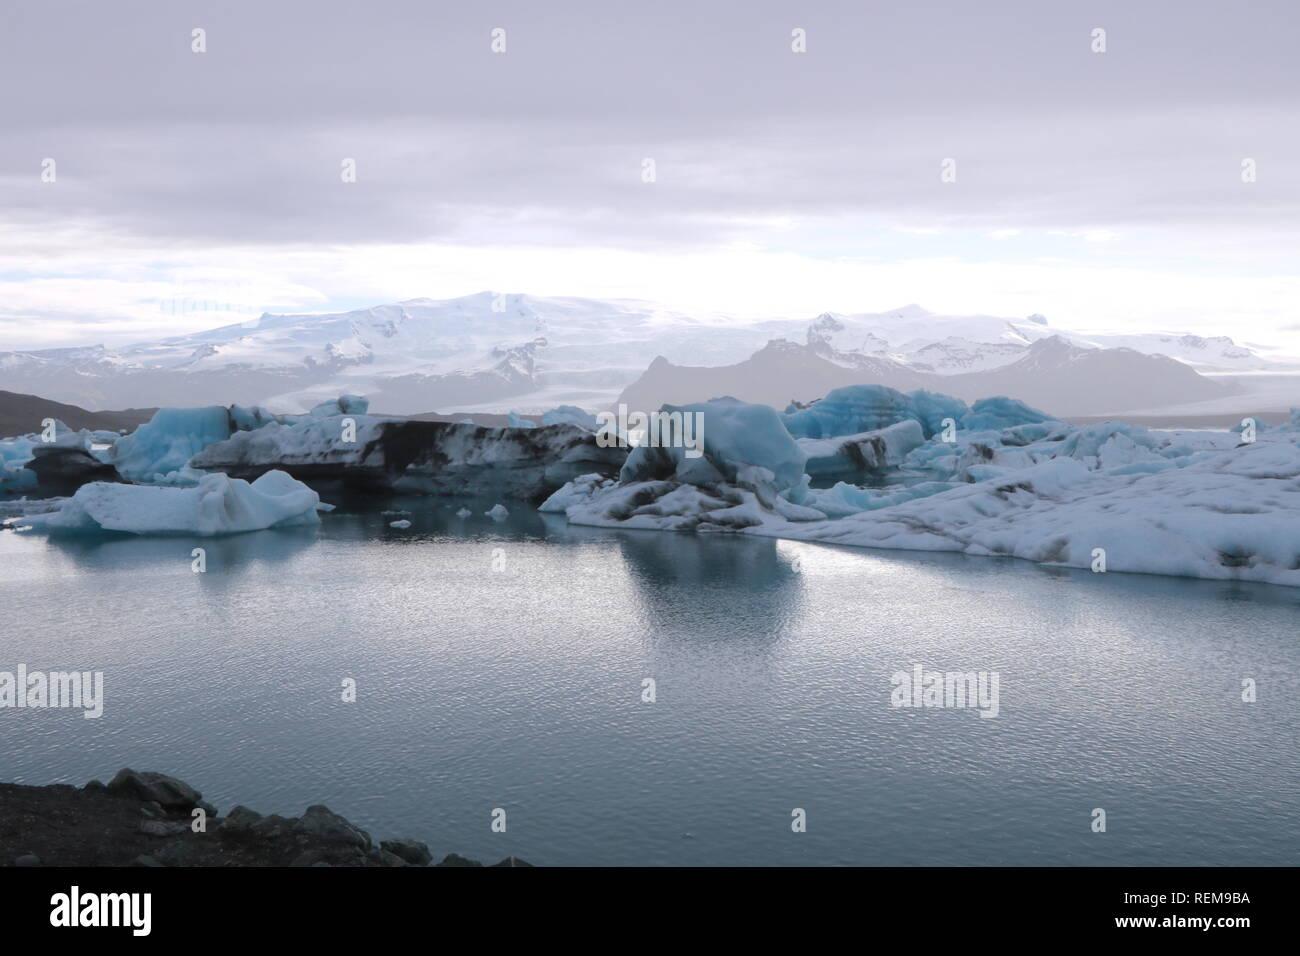 Afternoon in iceland jökulsárlón glacier lagoon - Stock Image